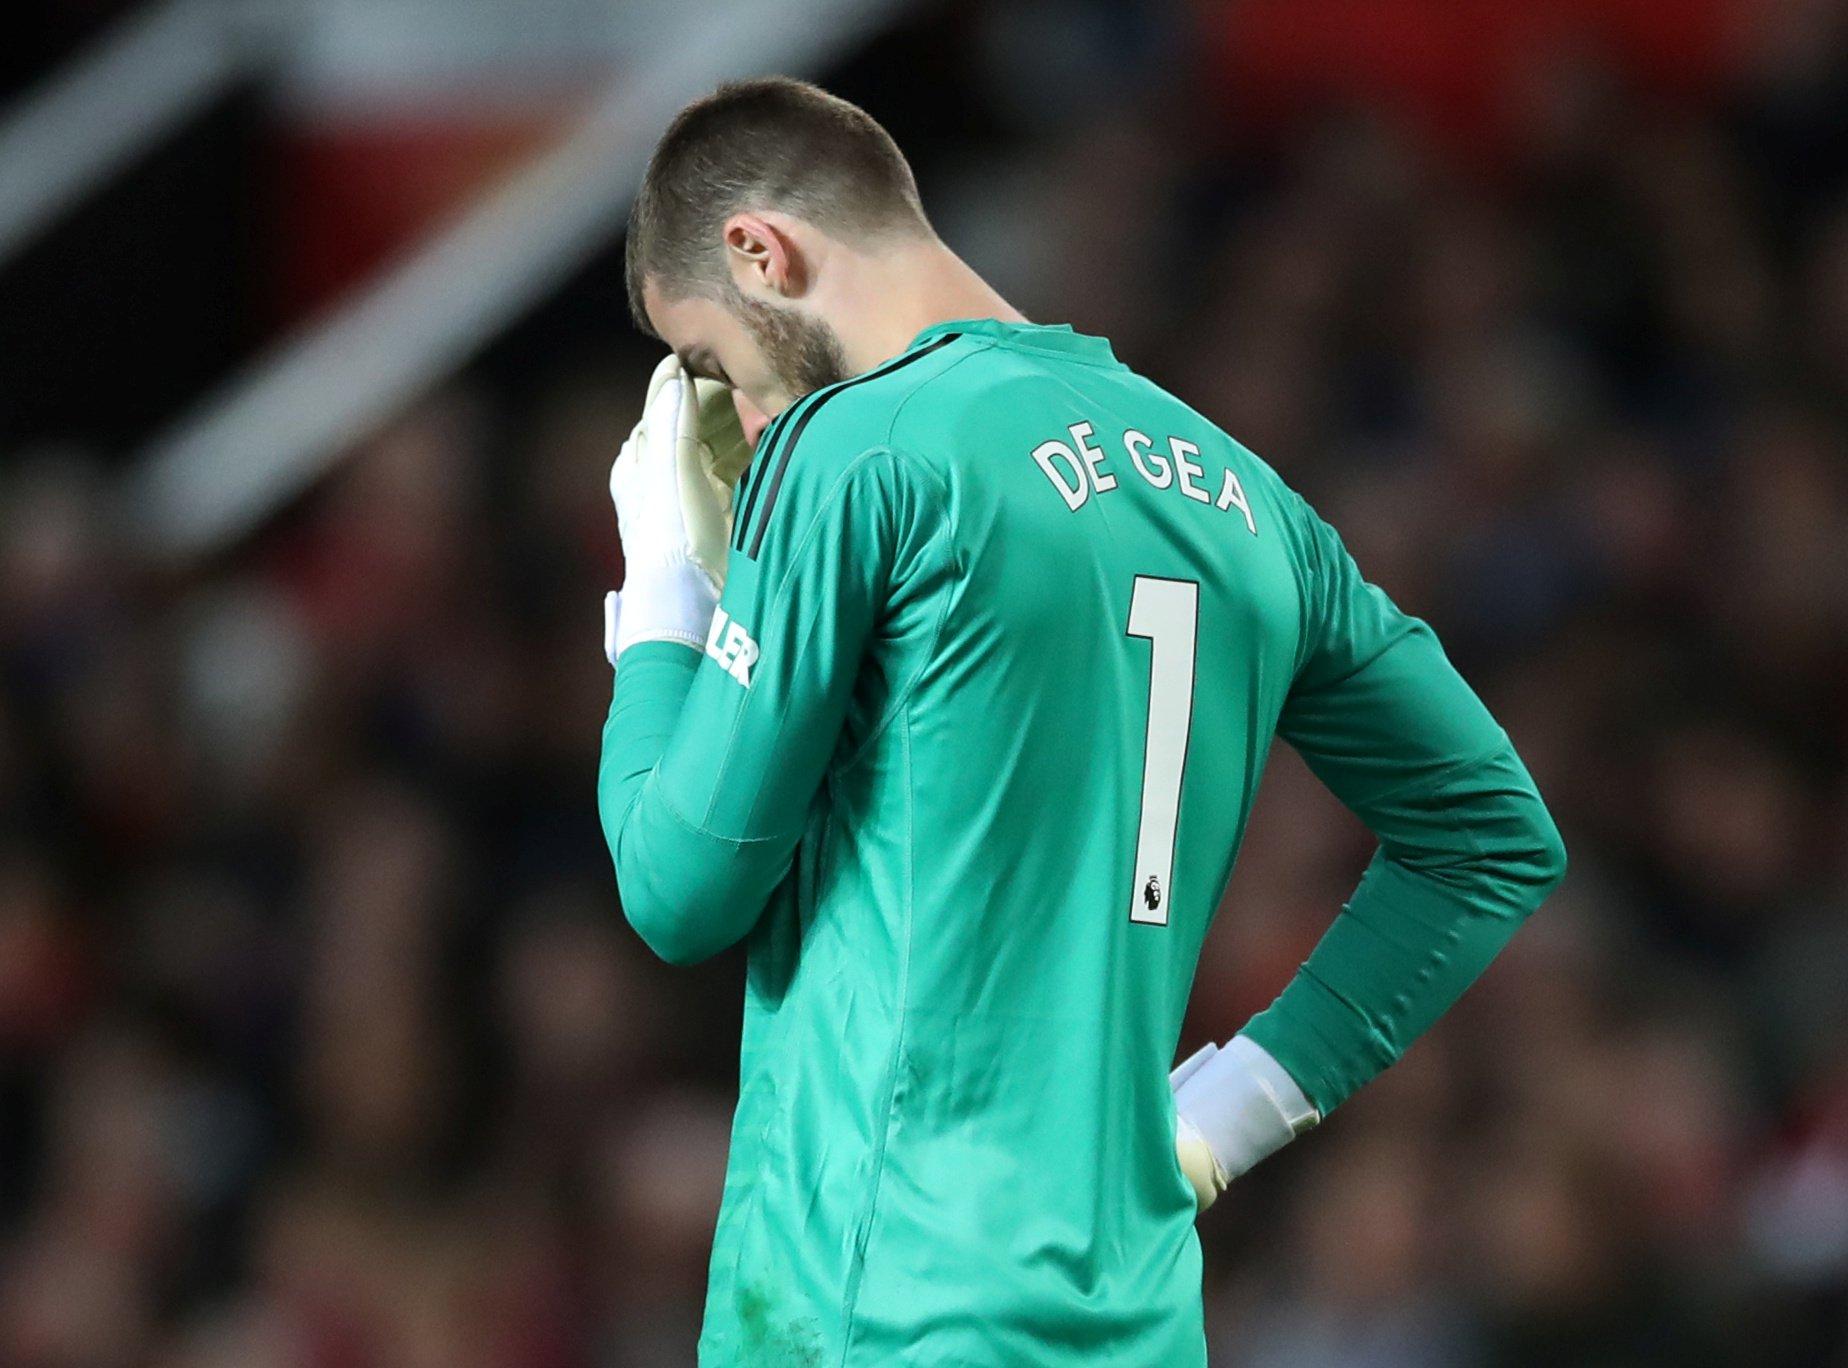 Man Utd star David de Gea 'close to tears' after losing to Man City as he considers transfer